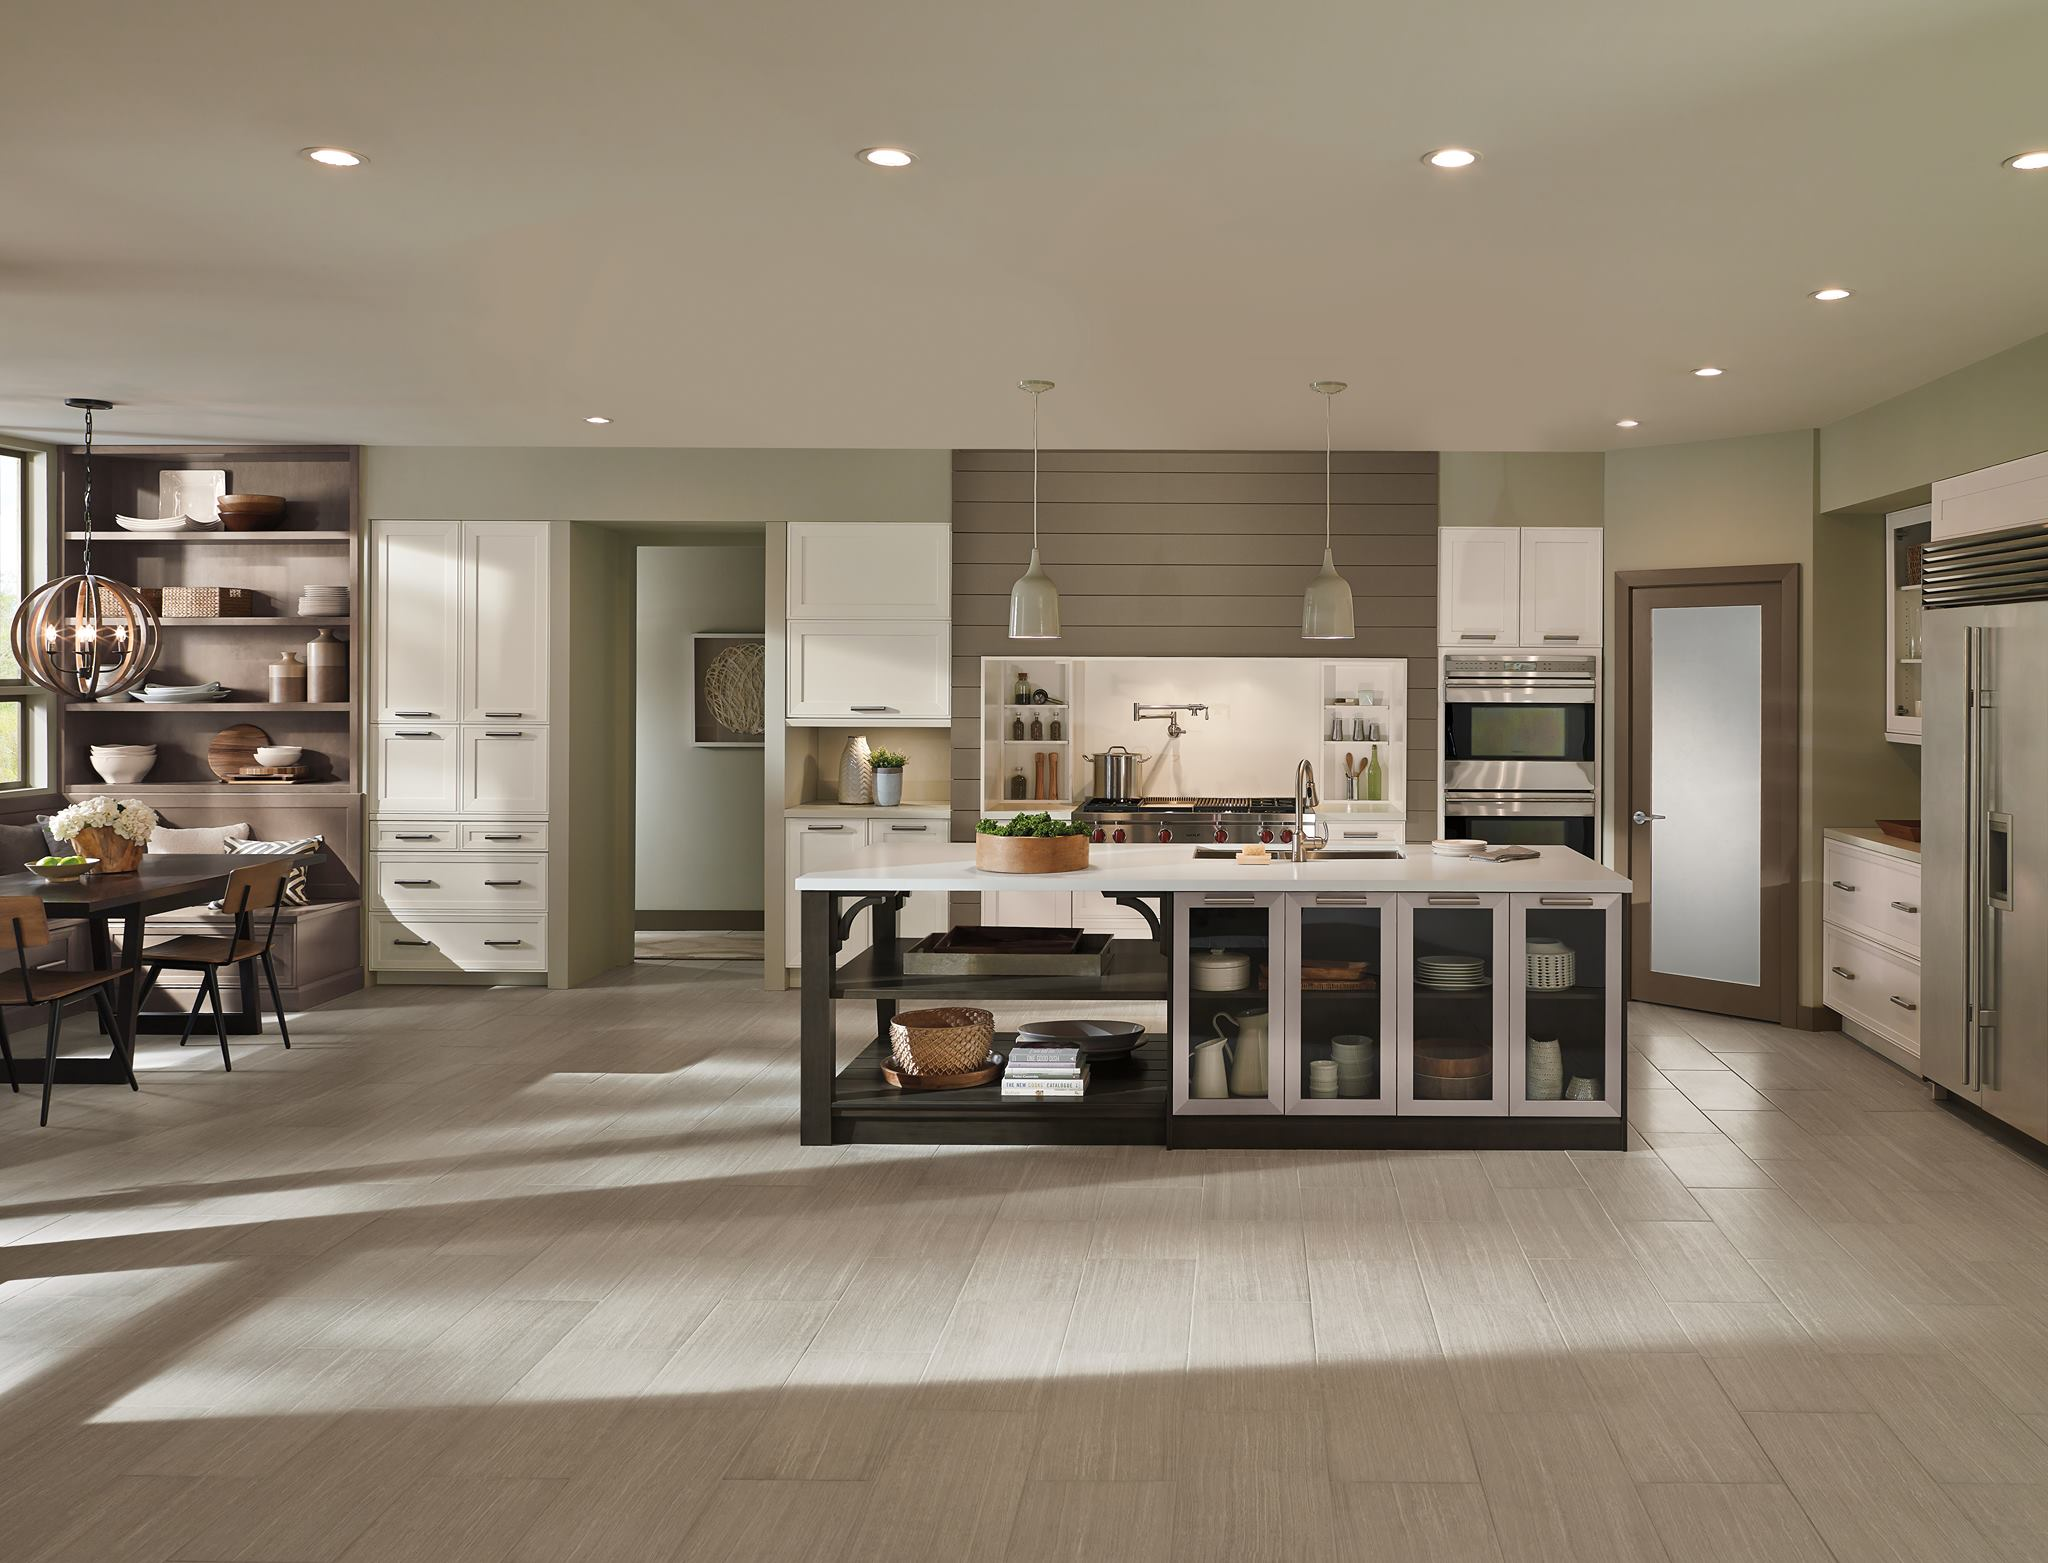 Transitional Kitchen Renovation Designs Toronto Transitional Kitchen Design